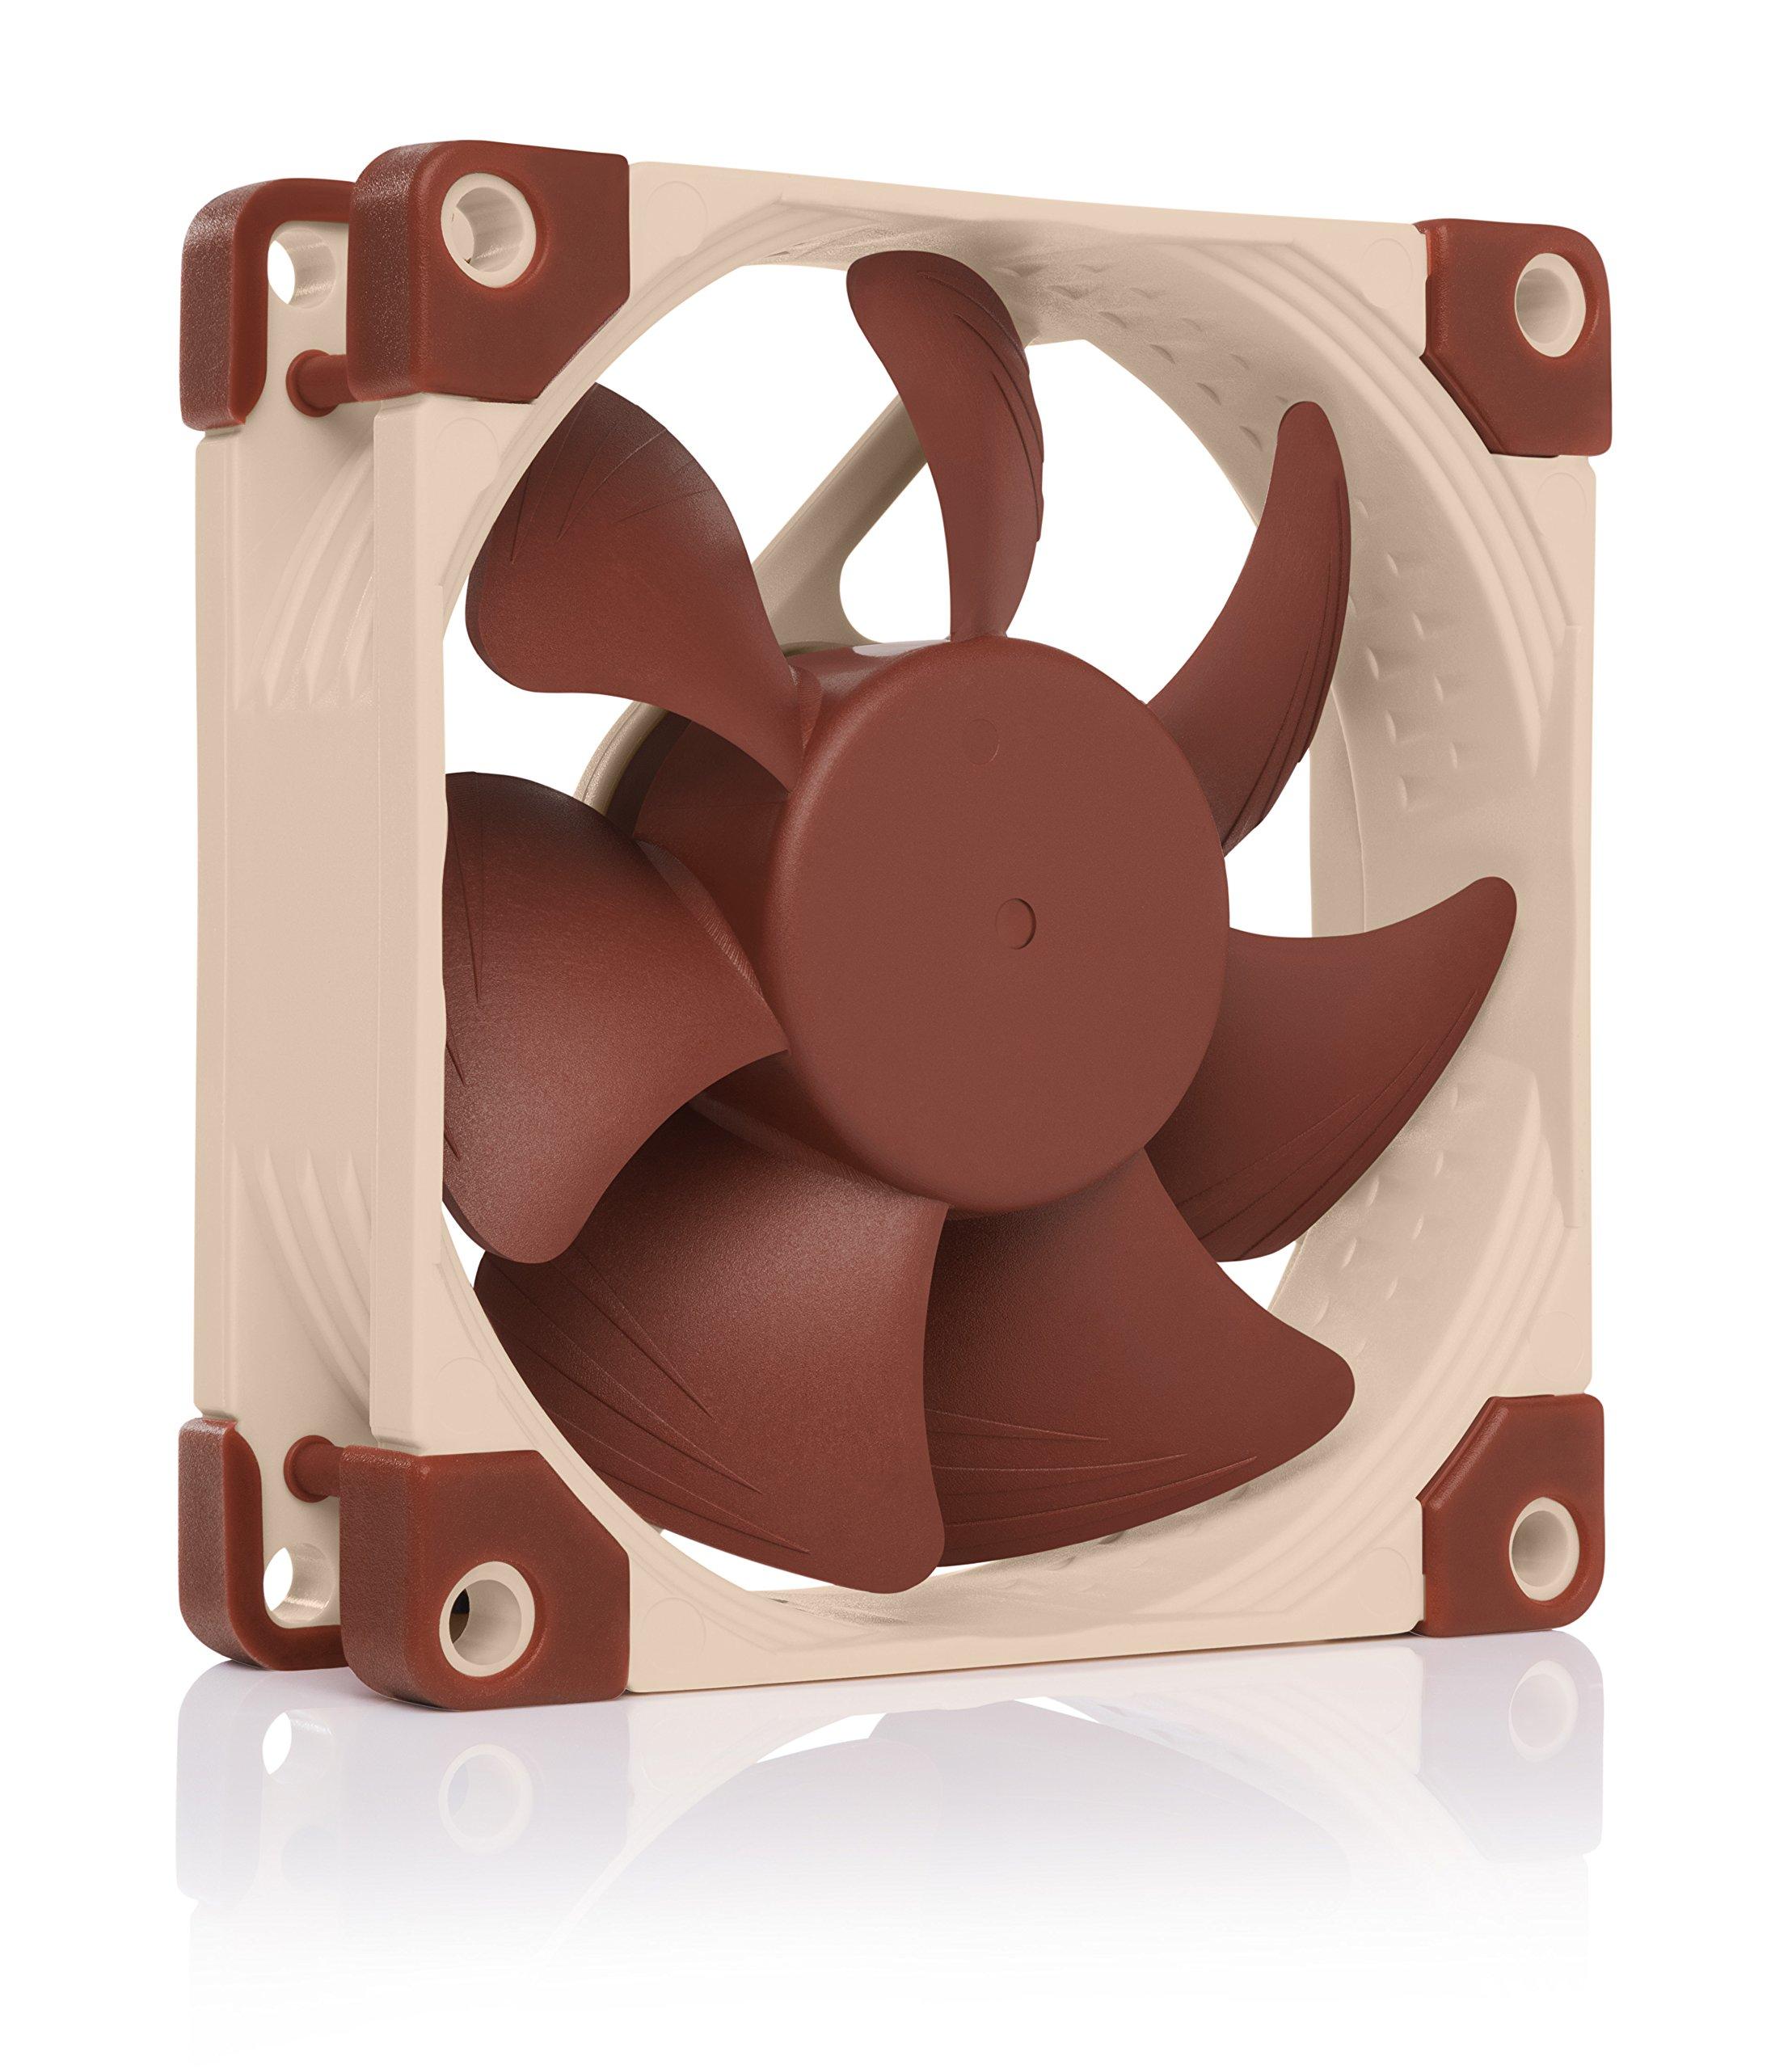 Noctua AAO Frame Design, SSO2 Bearing Premium Quality Quite Fan NF-A8 PWM by NOCTUA